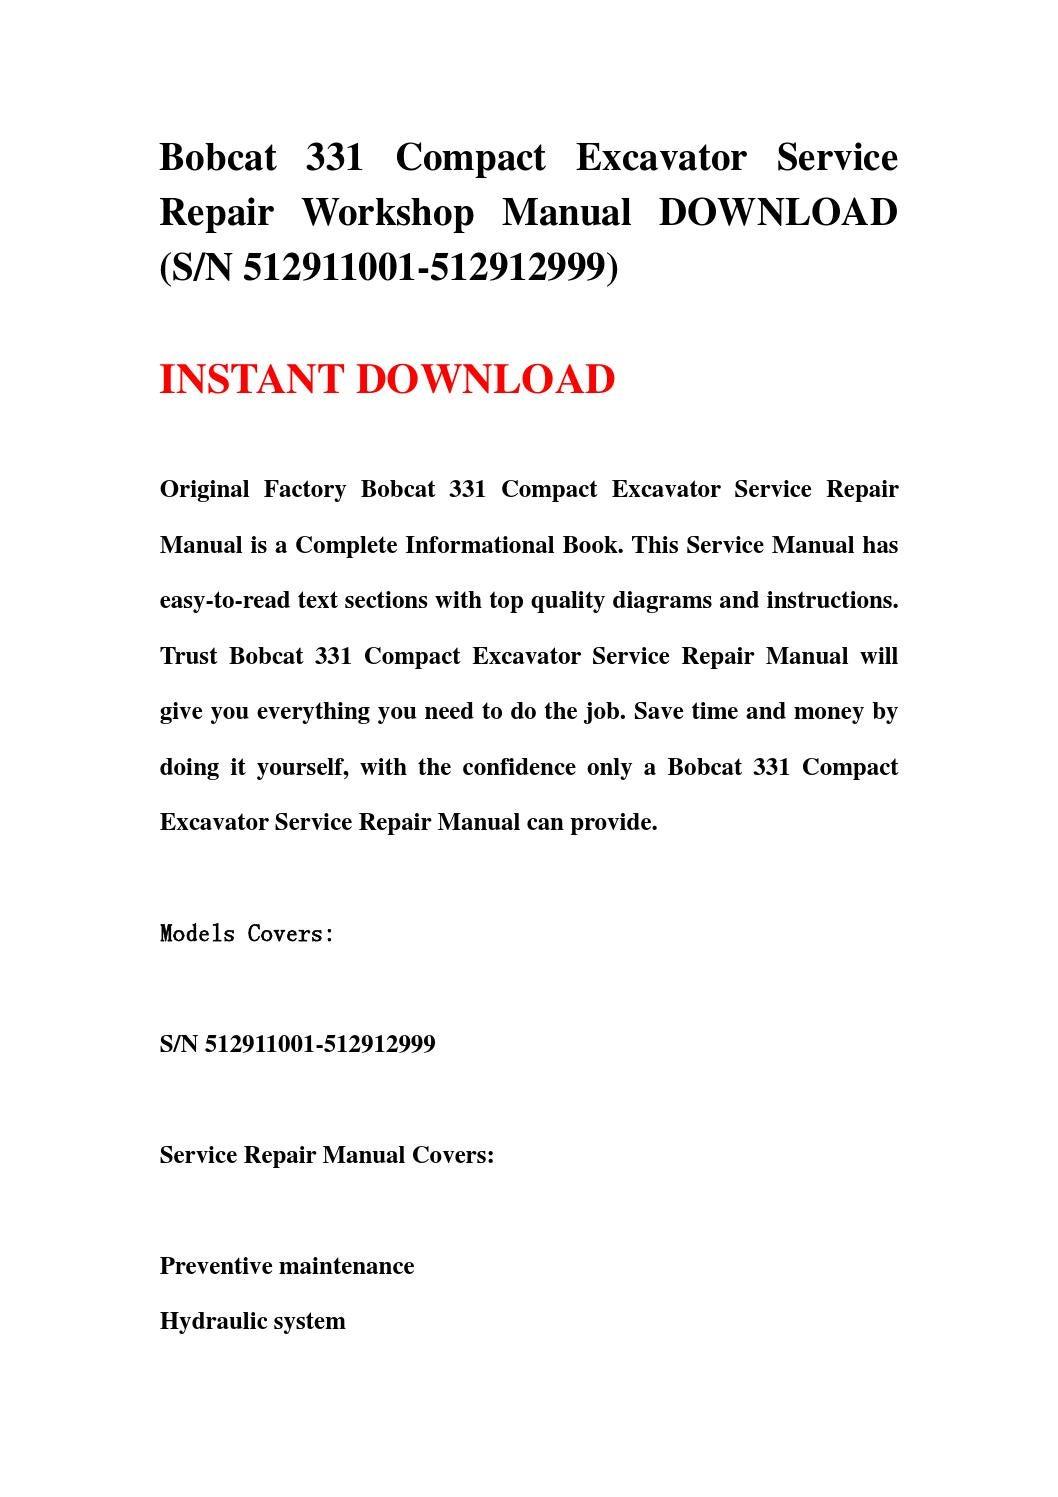 bobcat 331 service manual download